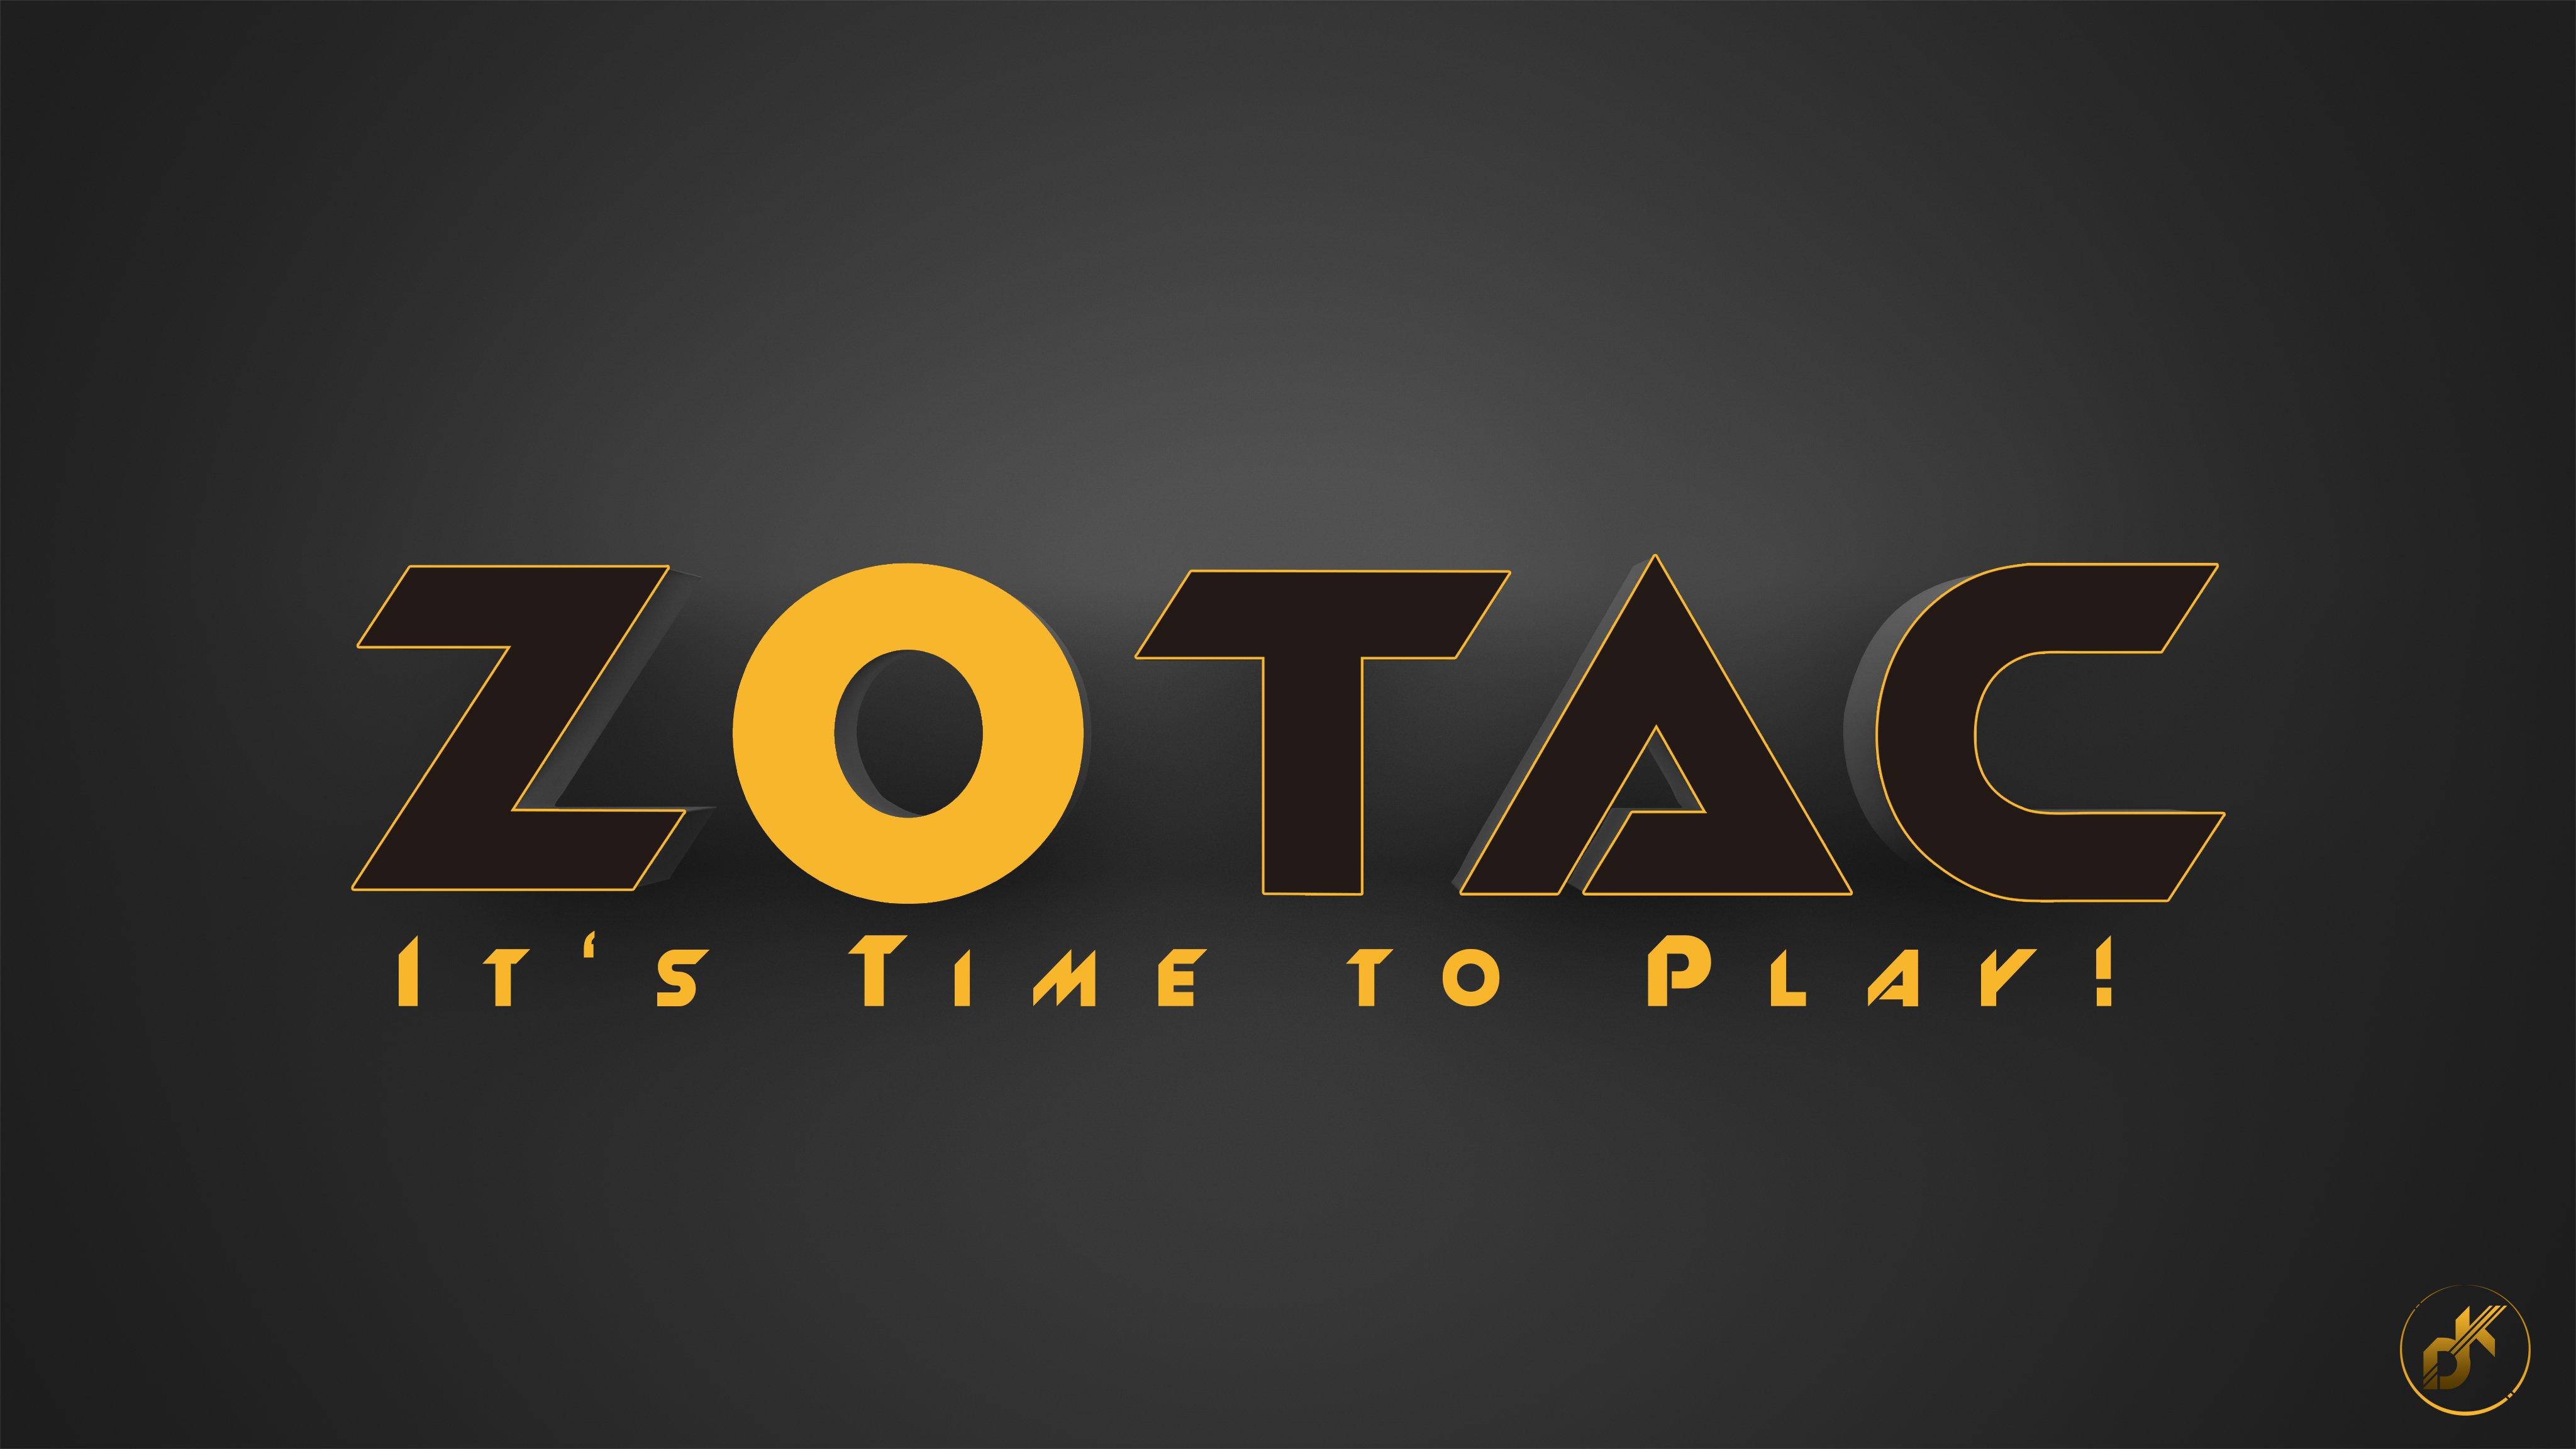 Logotipo da ZOTAC